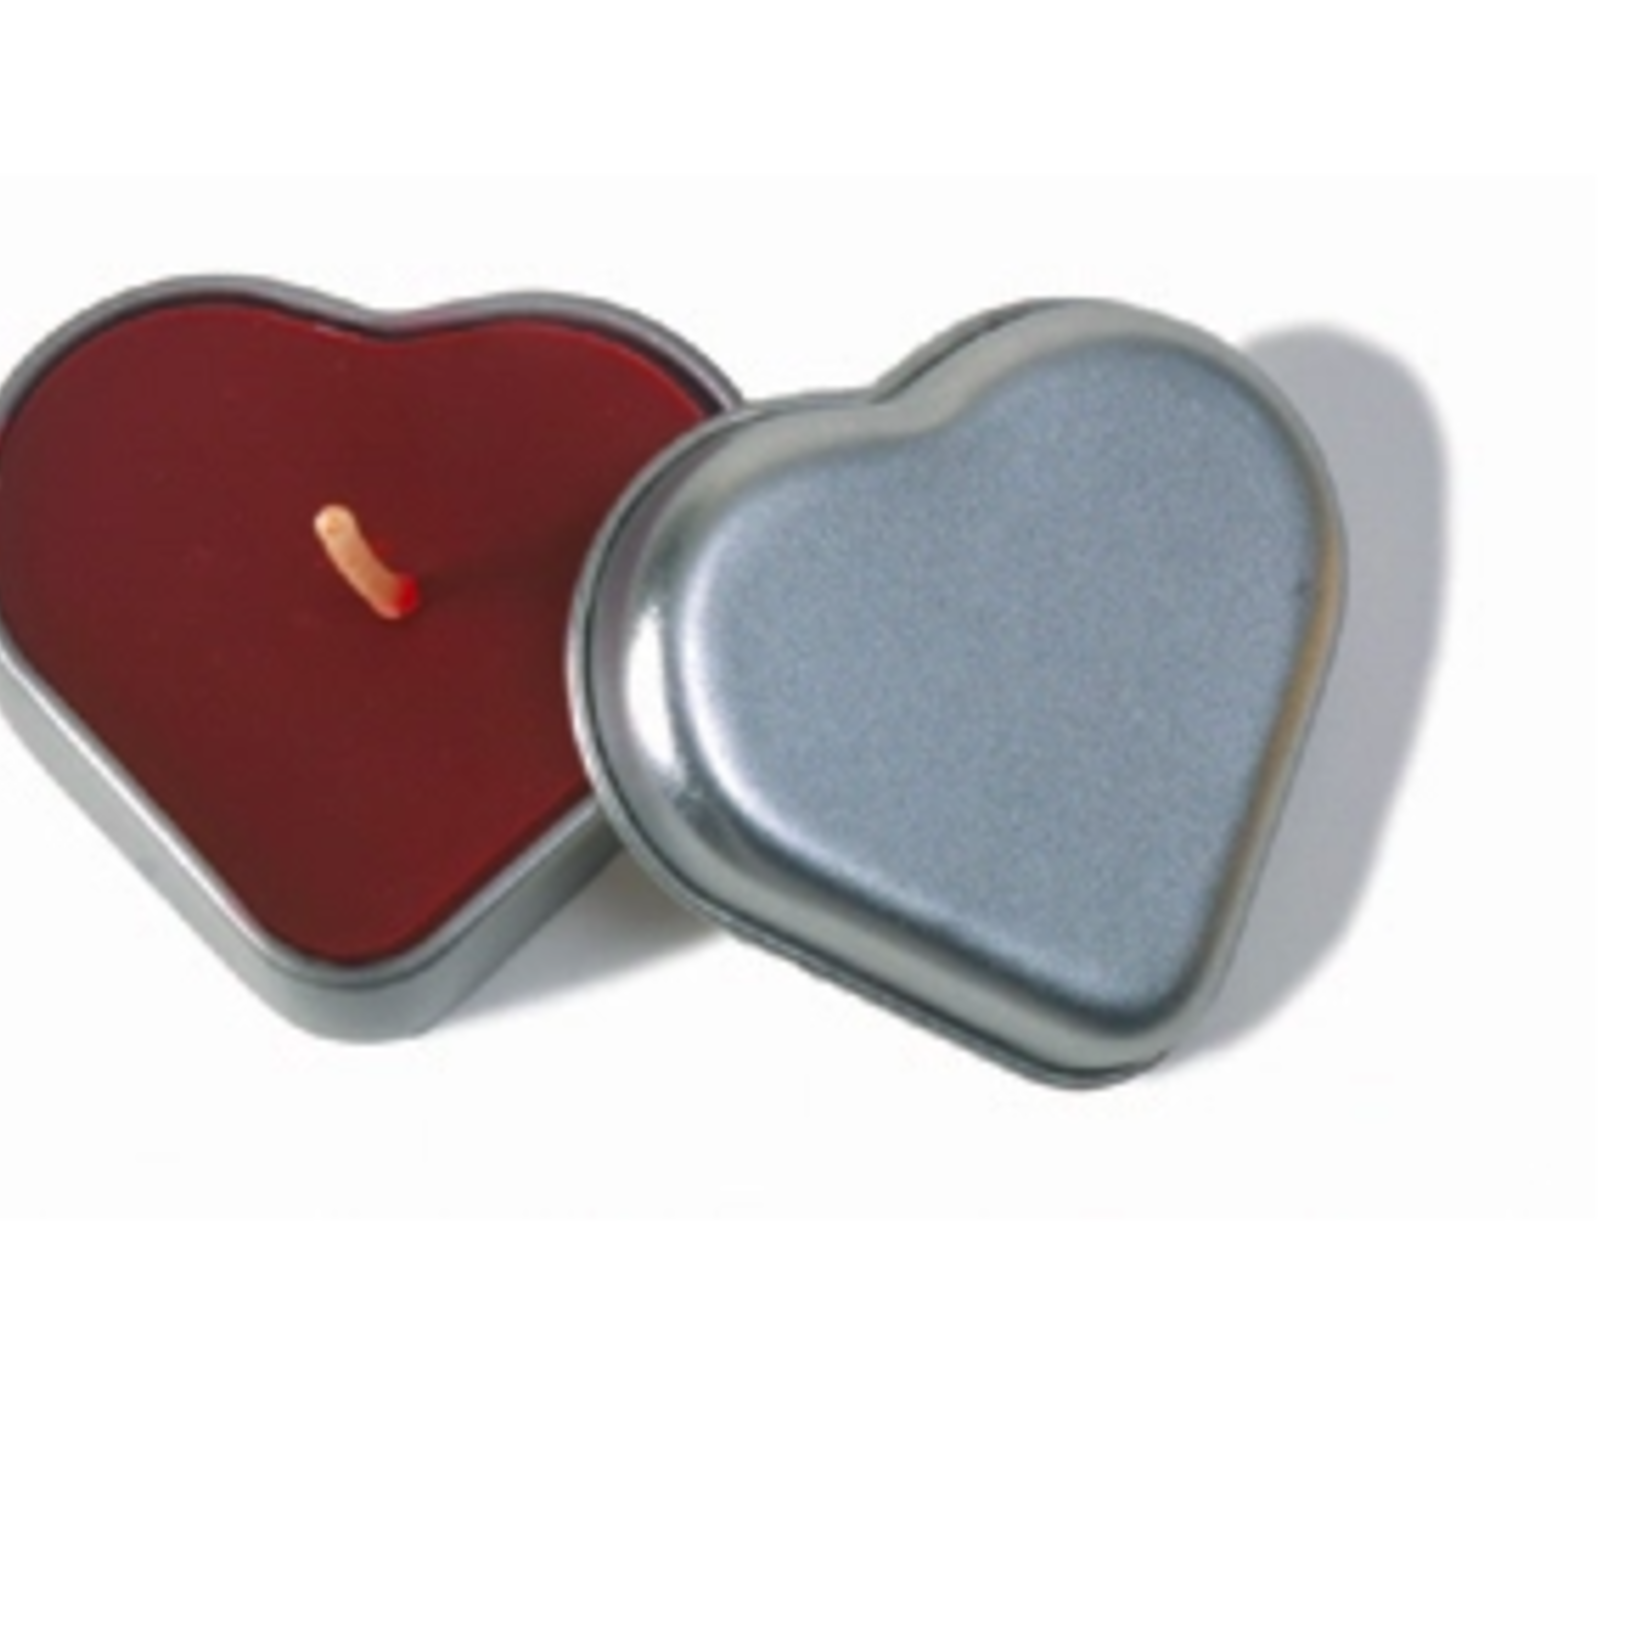 Big Dipper Heart Candle Tin